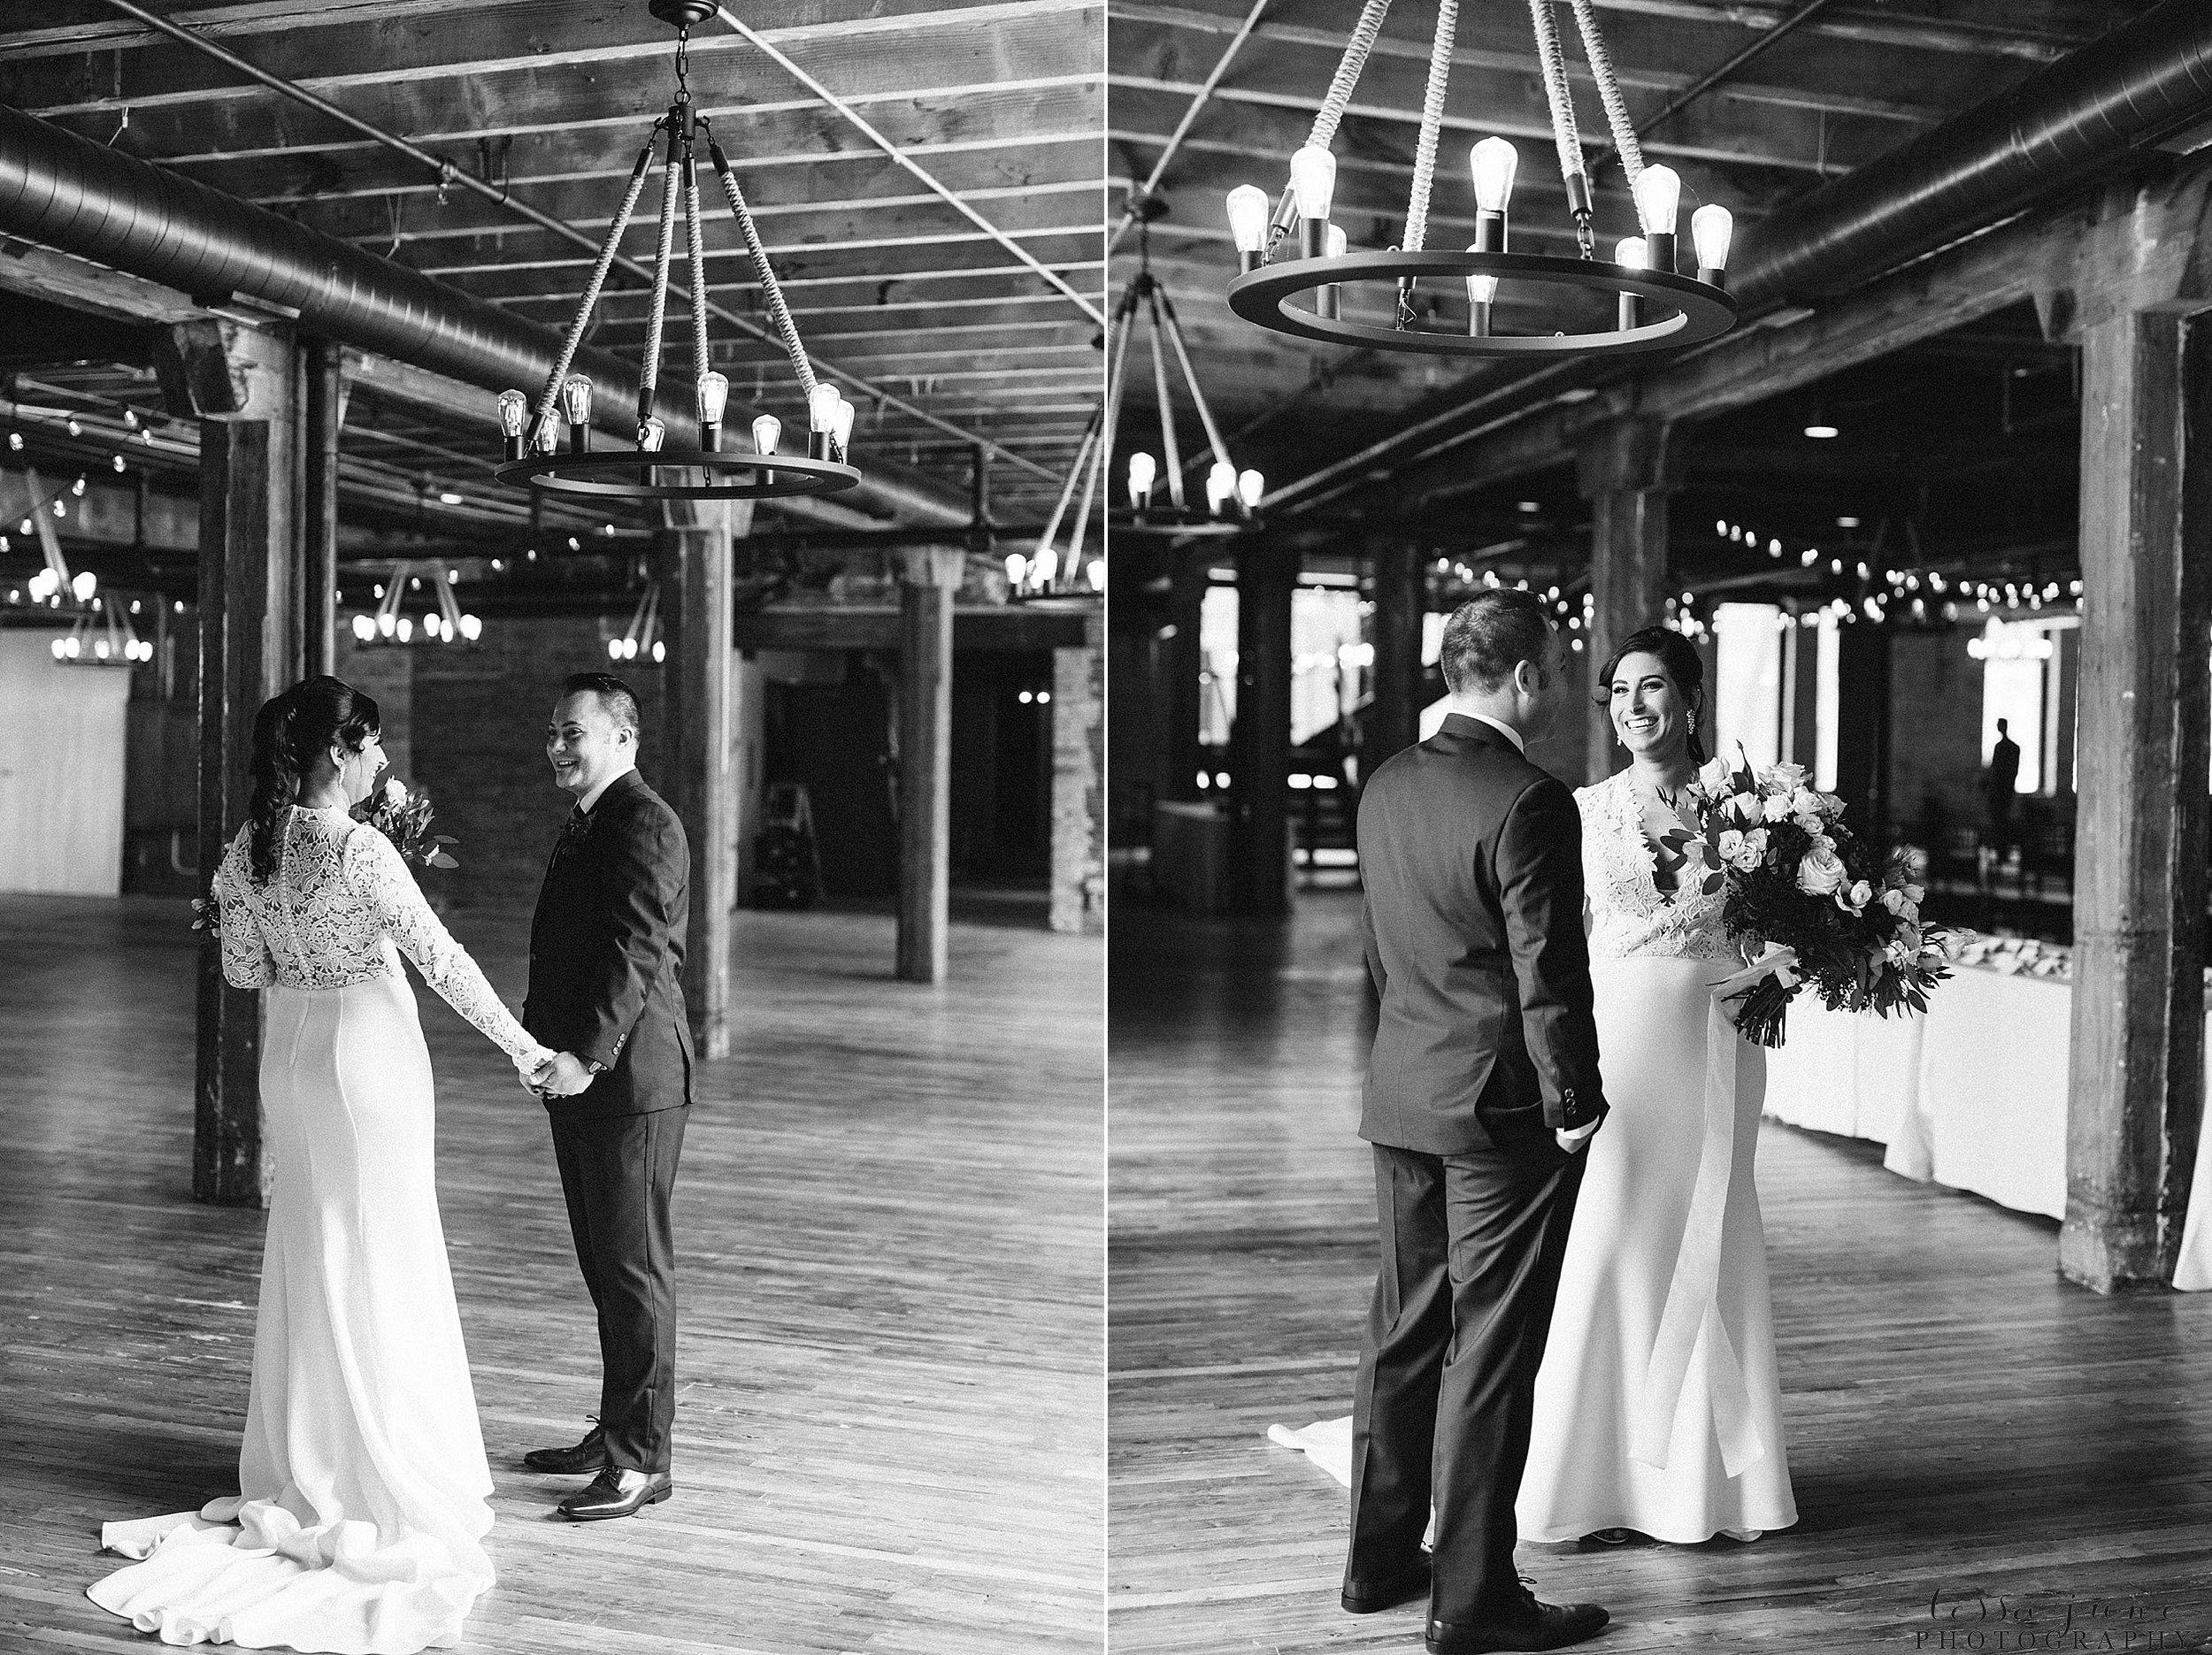 minneapolis-event-center-winter-romantic-snow-wedding-december-65.jpg